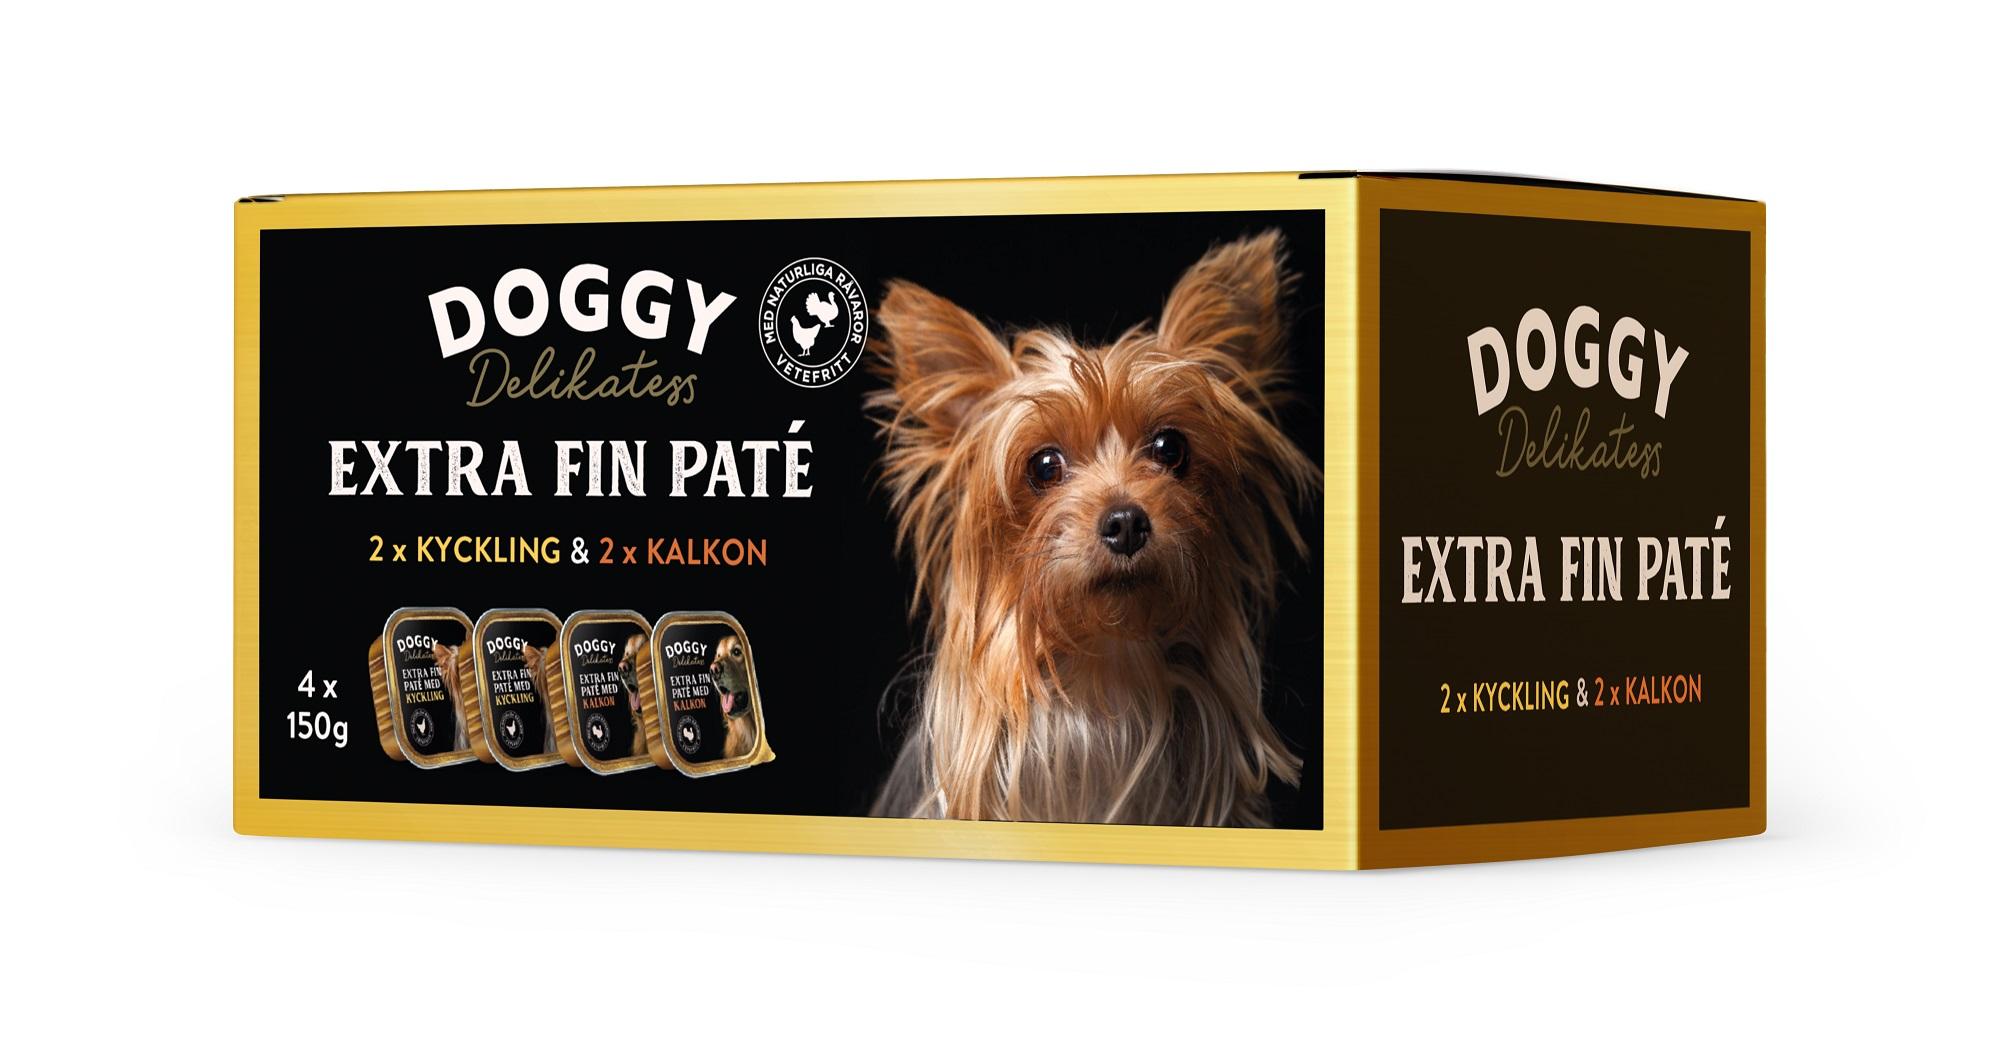 Doggy Deli paté Multibox Kyck Kalkon 600g